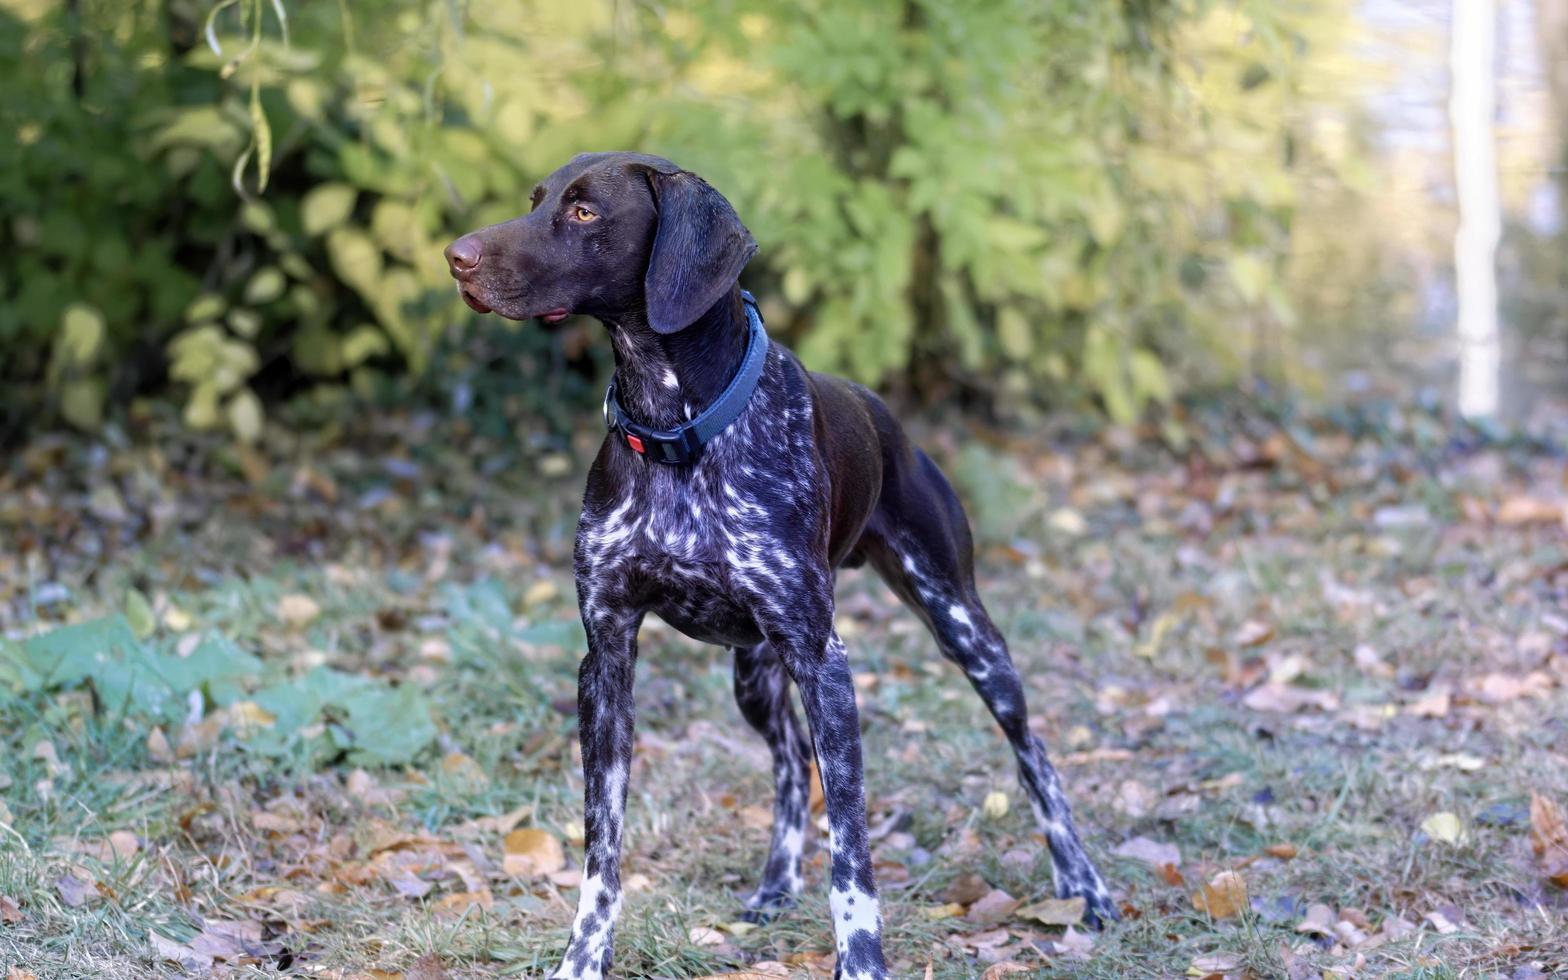 cachorro de casaco curto na grama foto